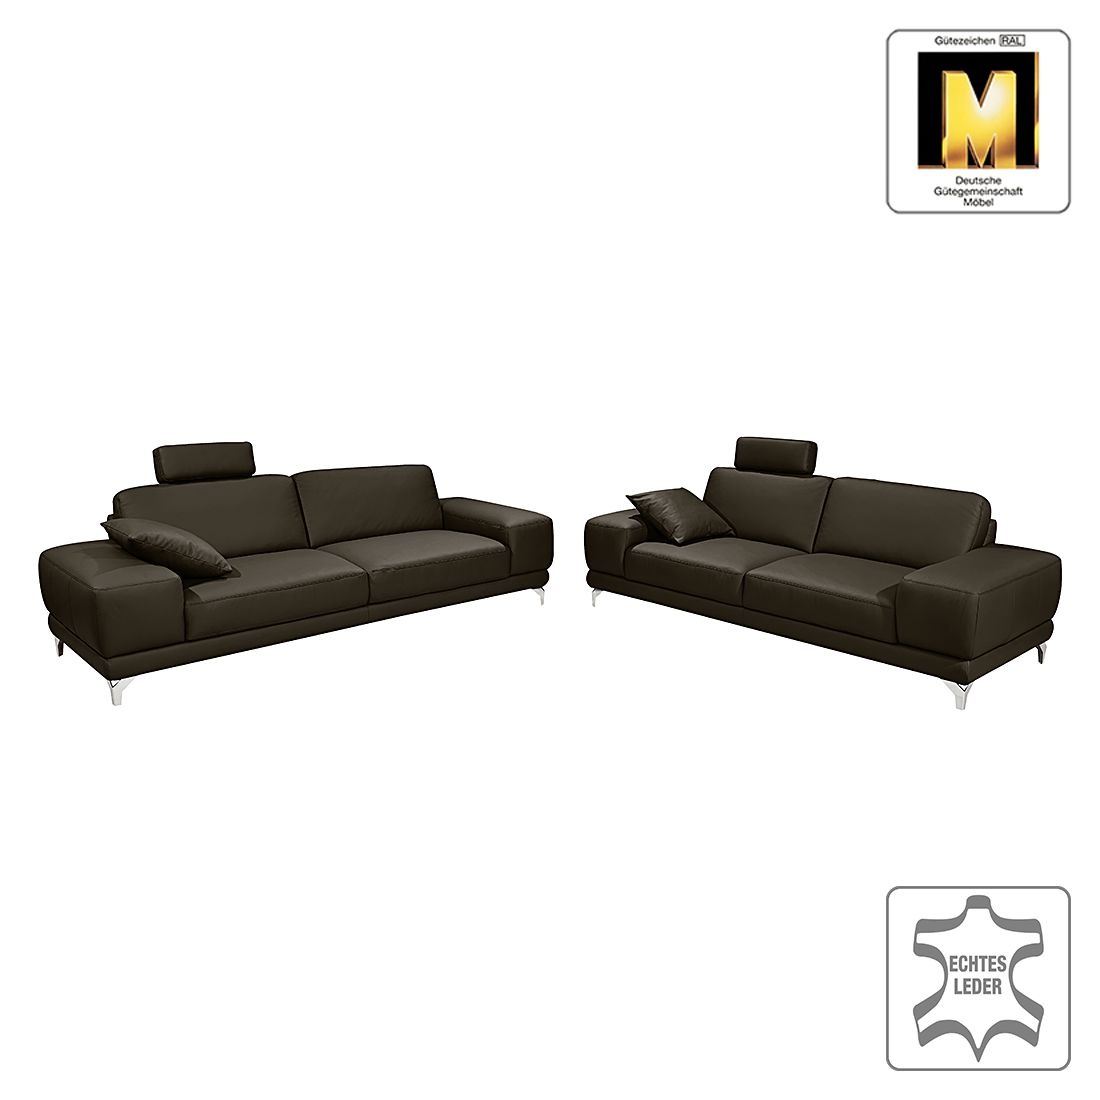 sitzgruppe barcelona 3 2 1 echtleder keine funktion dunkelbraun ada premium g nstig kaufen. Black Bedroom Furniture Sets. Home Design Ideas